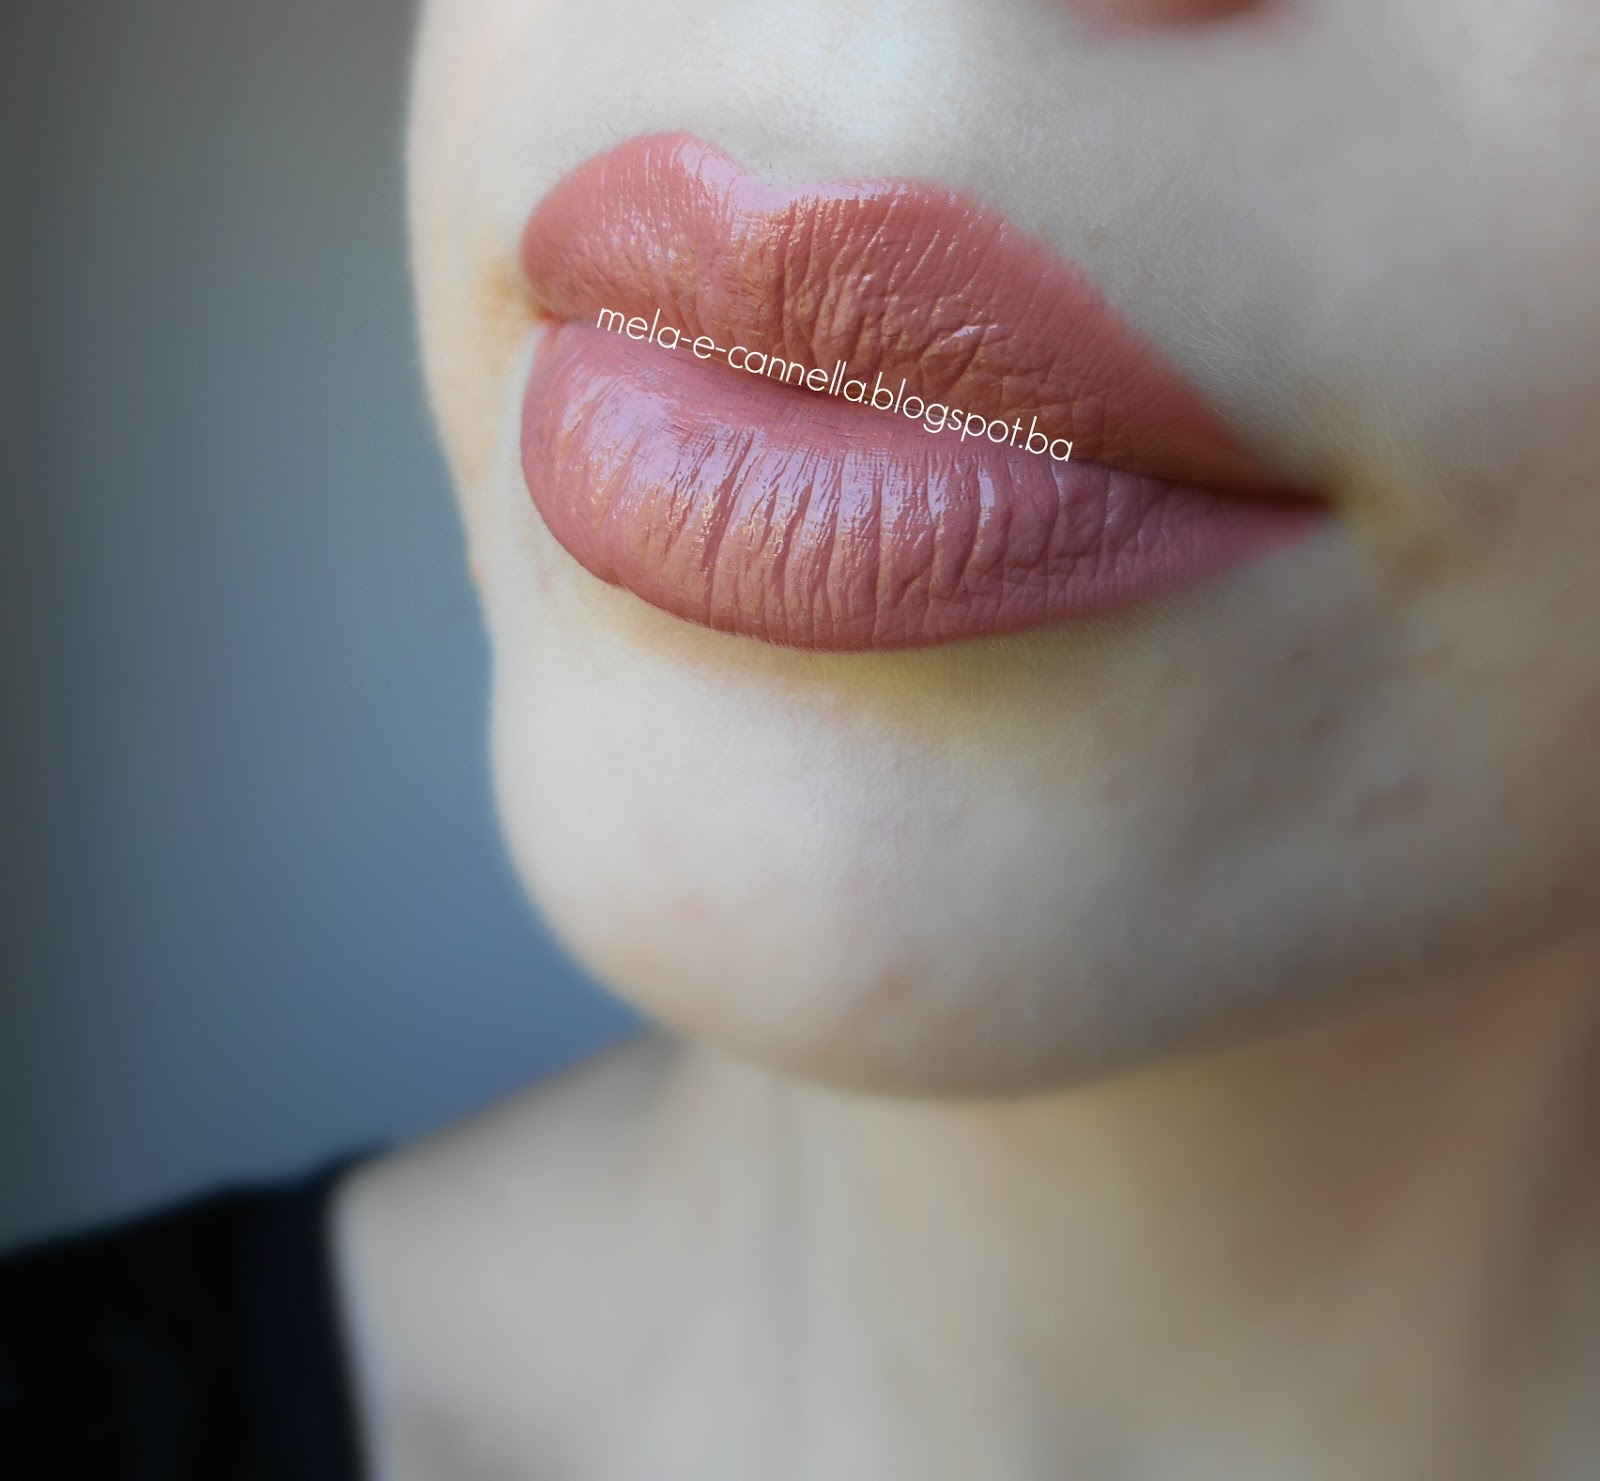 mela-e-cannella: Rimmel - Lasting Finish Kate Moss